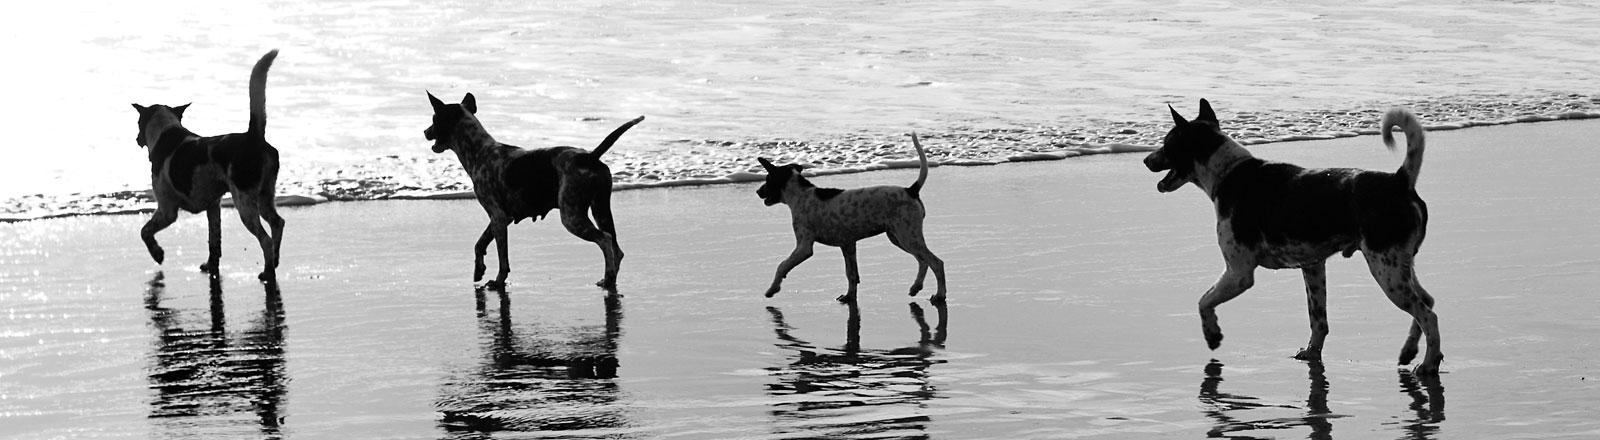 Ein Rudel Hunde am Strand.